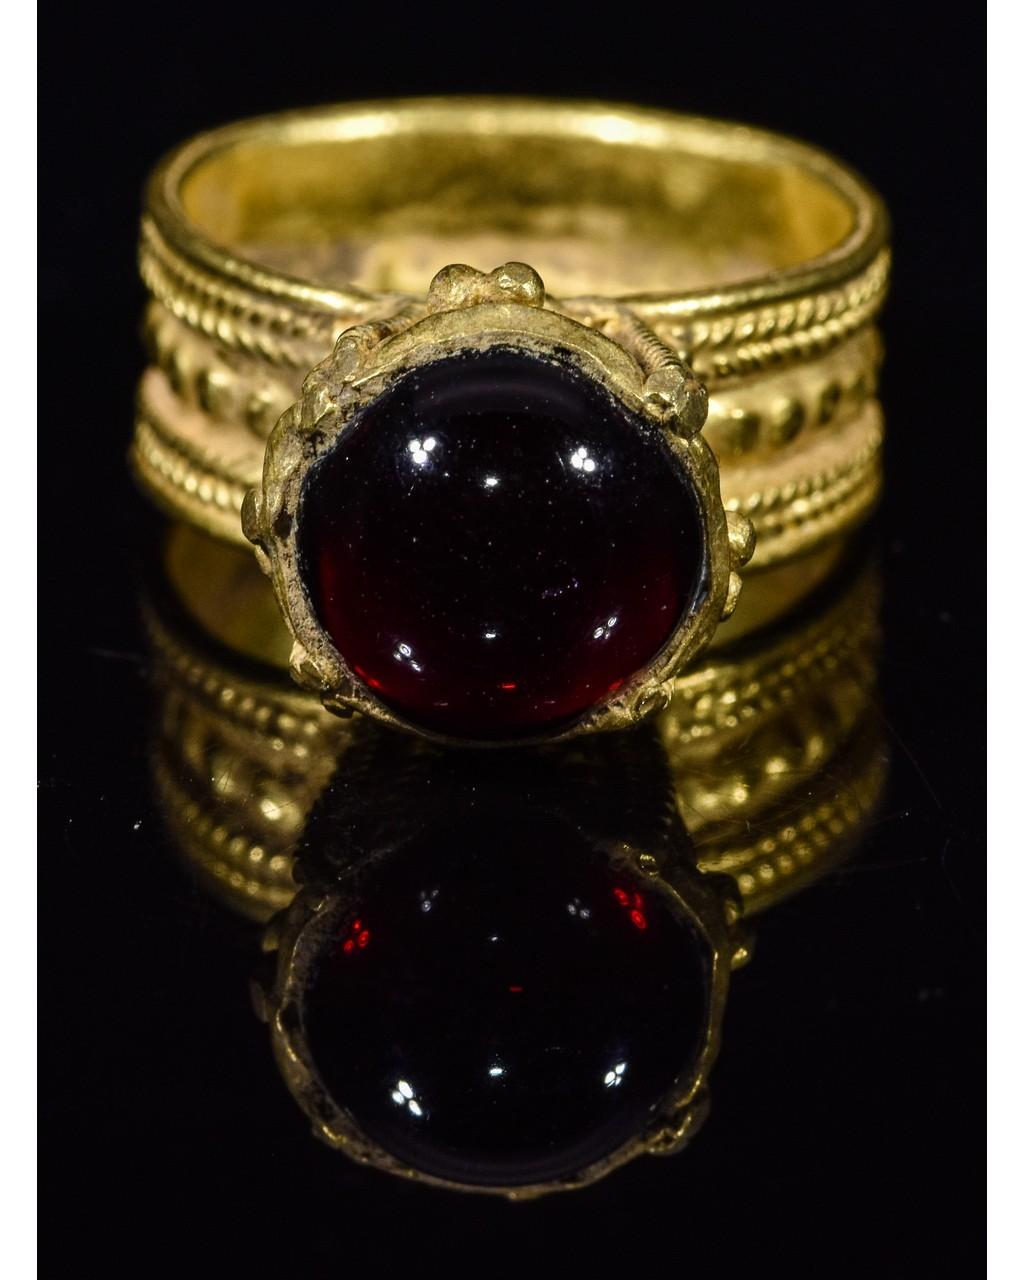 MEROVINGIAN GOLD RING WITH GARNET STONE - Image 2 of 5